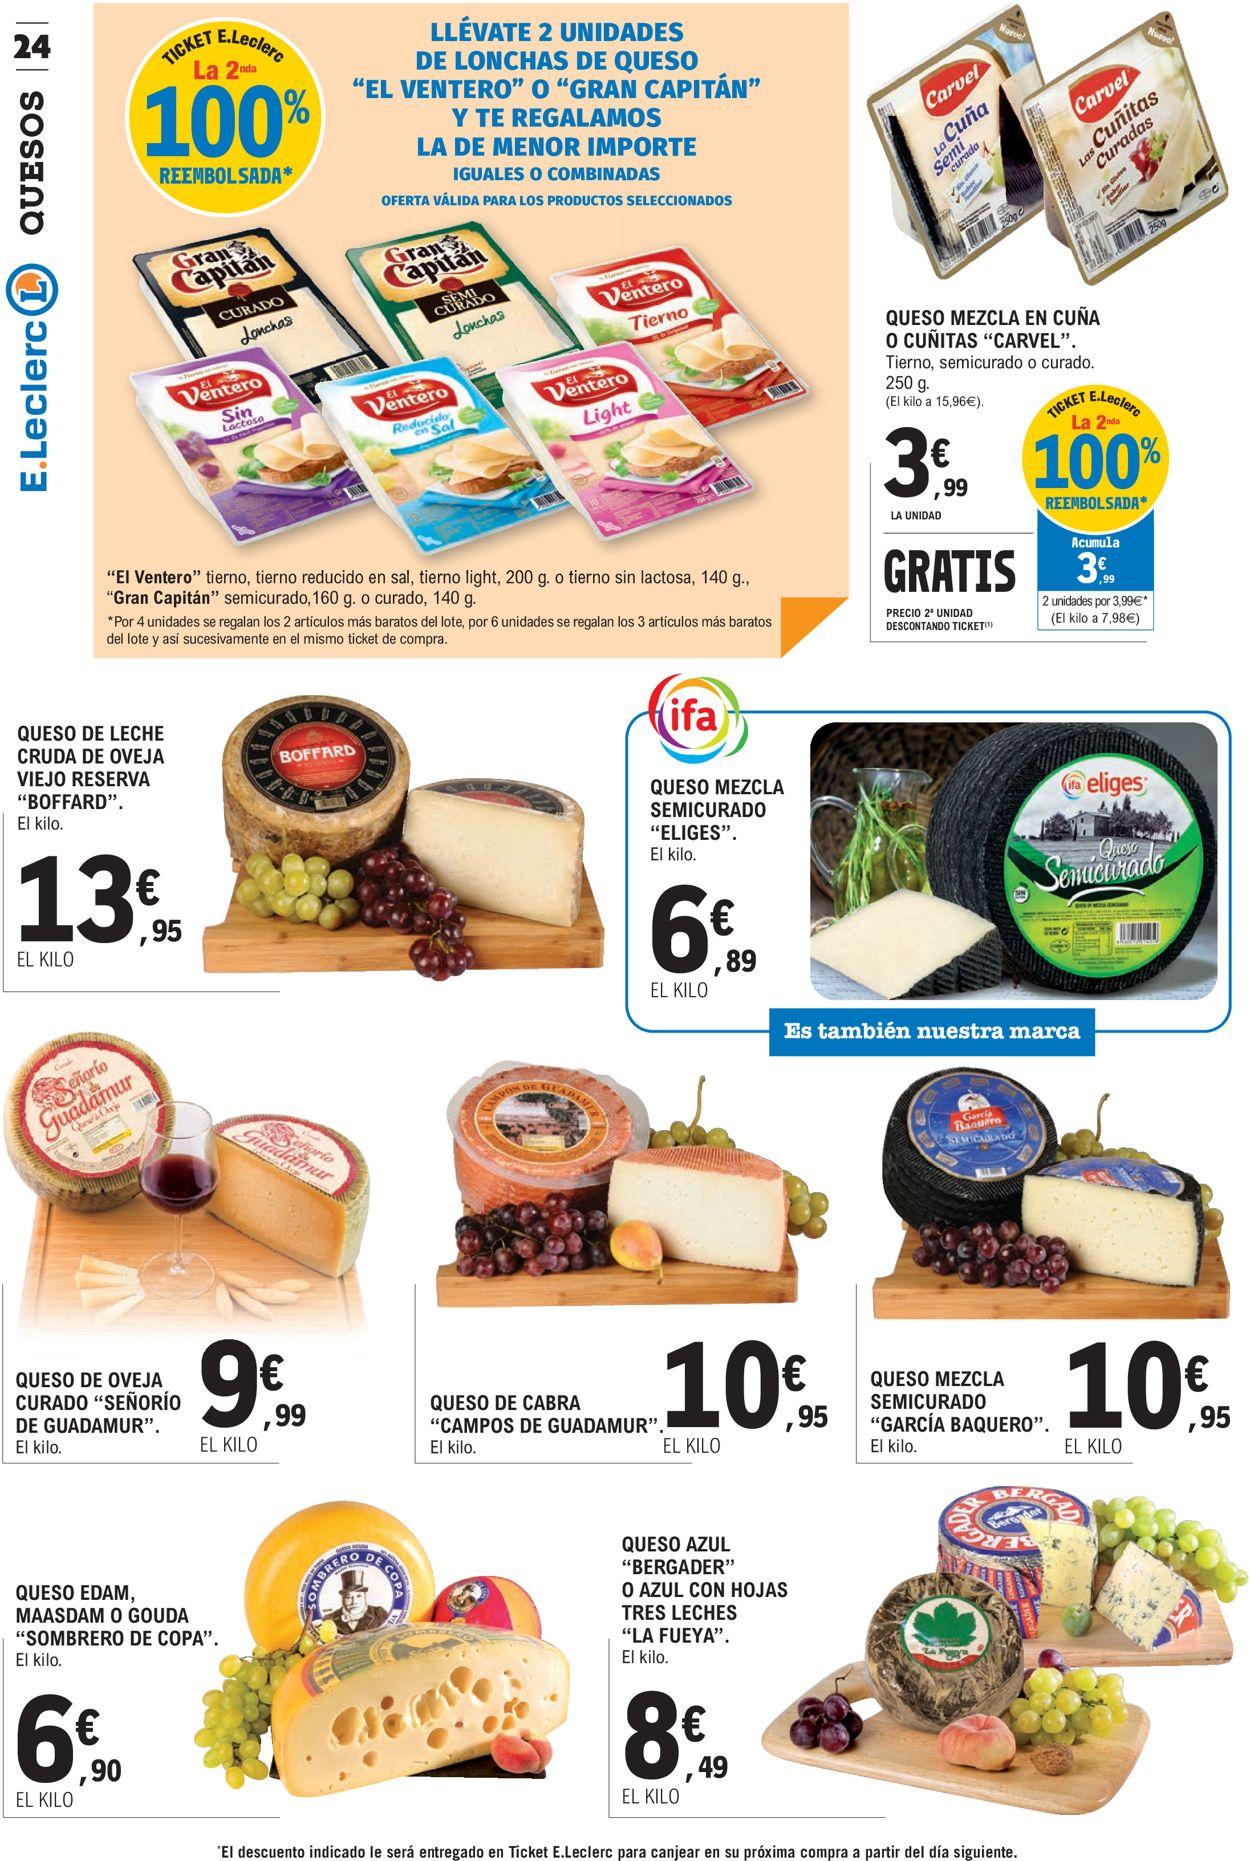 E.leclerc Folleto - 11.11-22.11.2020 (Página 24)